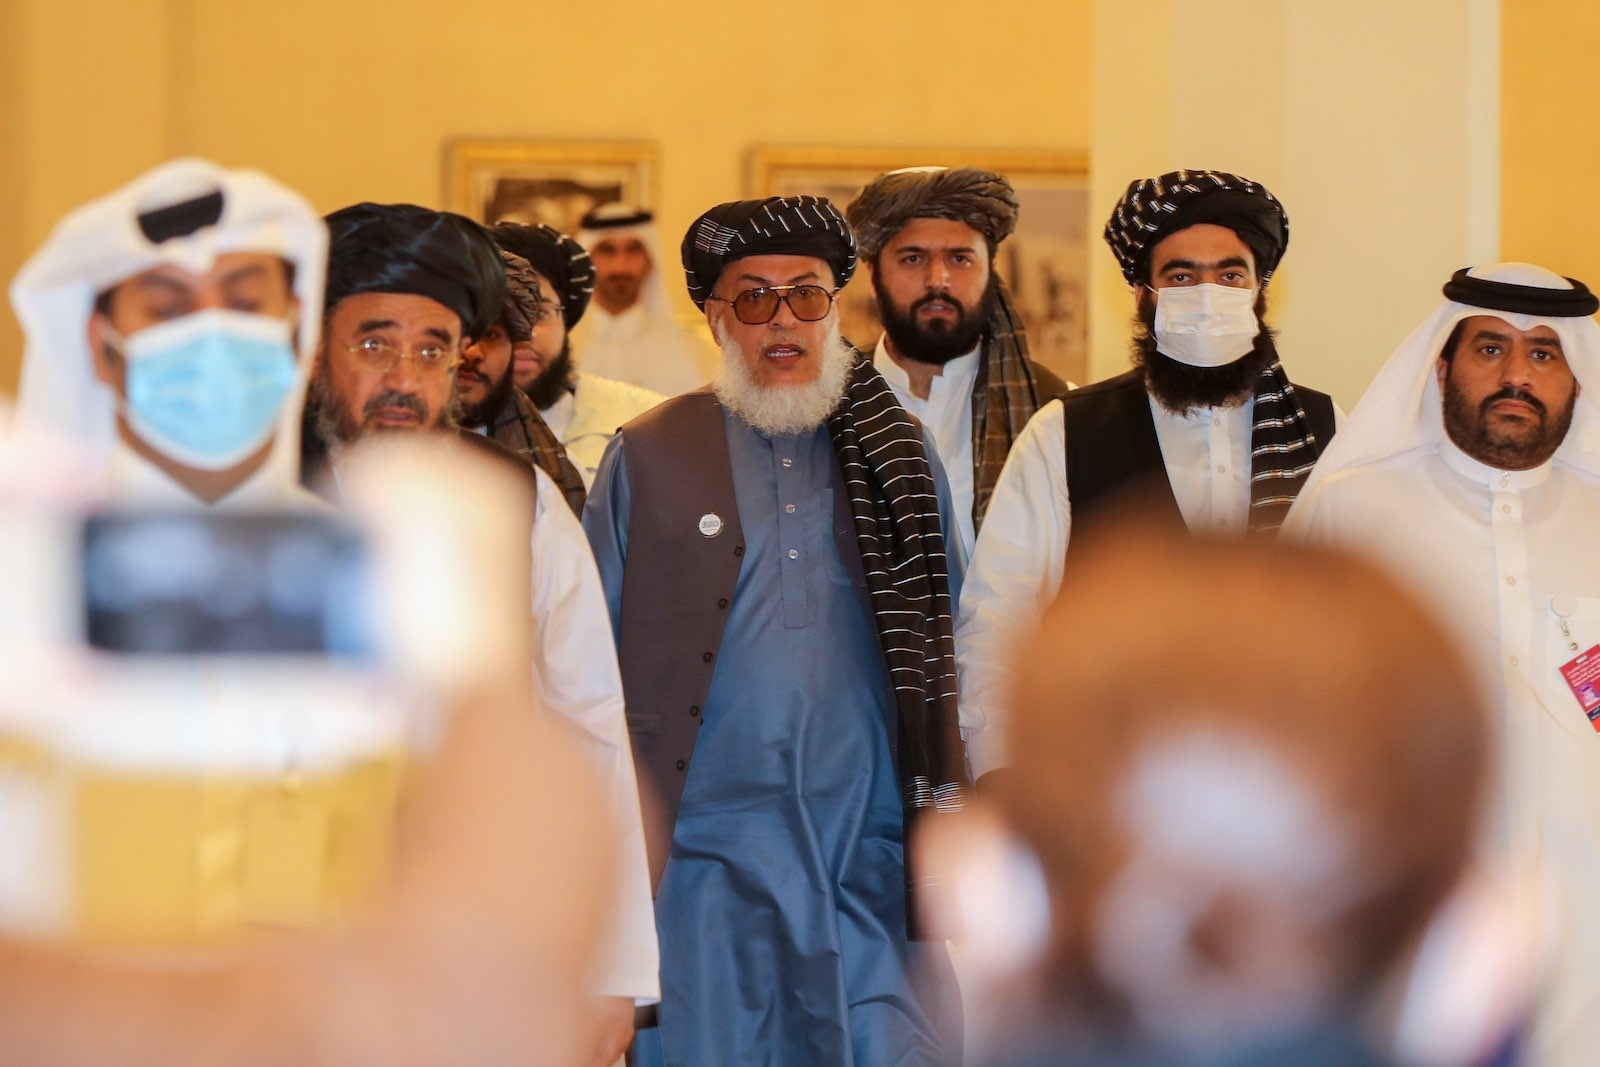 Taliban negotiator Mohammad Abbas Stanekzai arrives for intra-Afghan talks in Doha, Qatar, 12 September 2020 (Karim Jaafar/AFP via Getty Images)